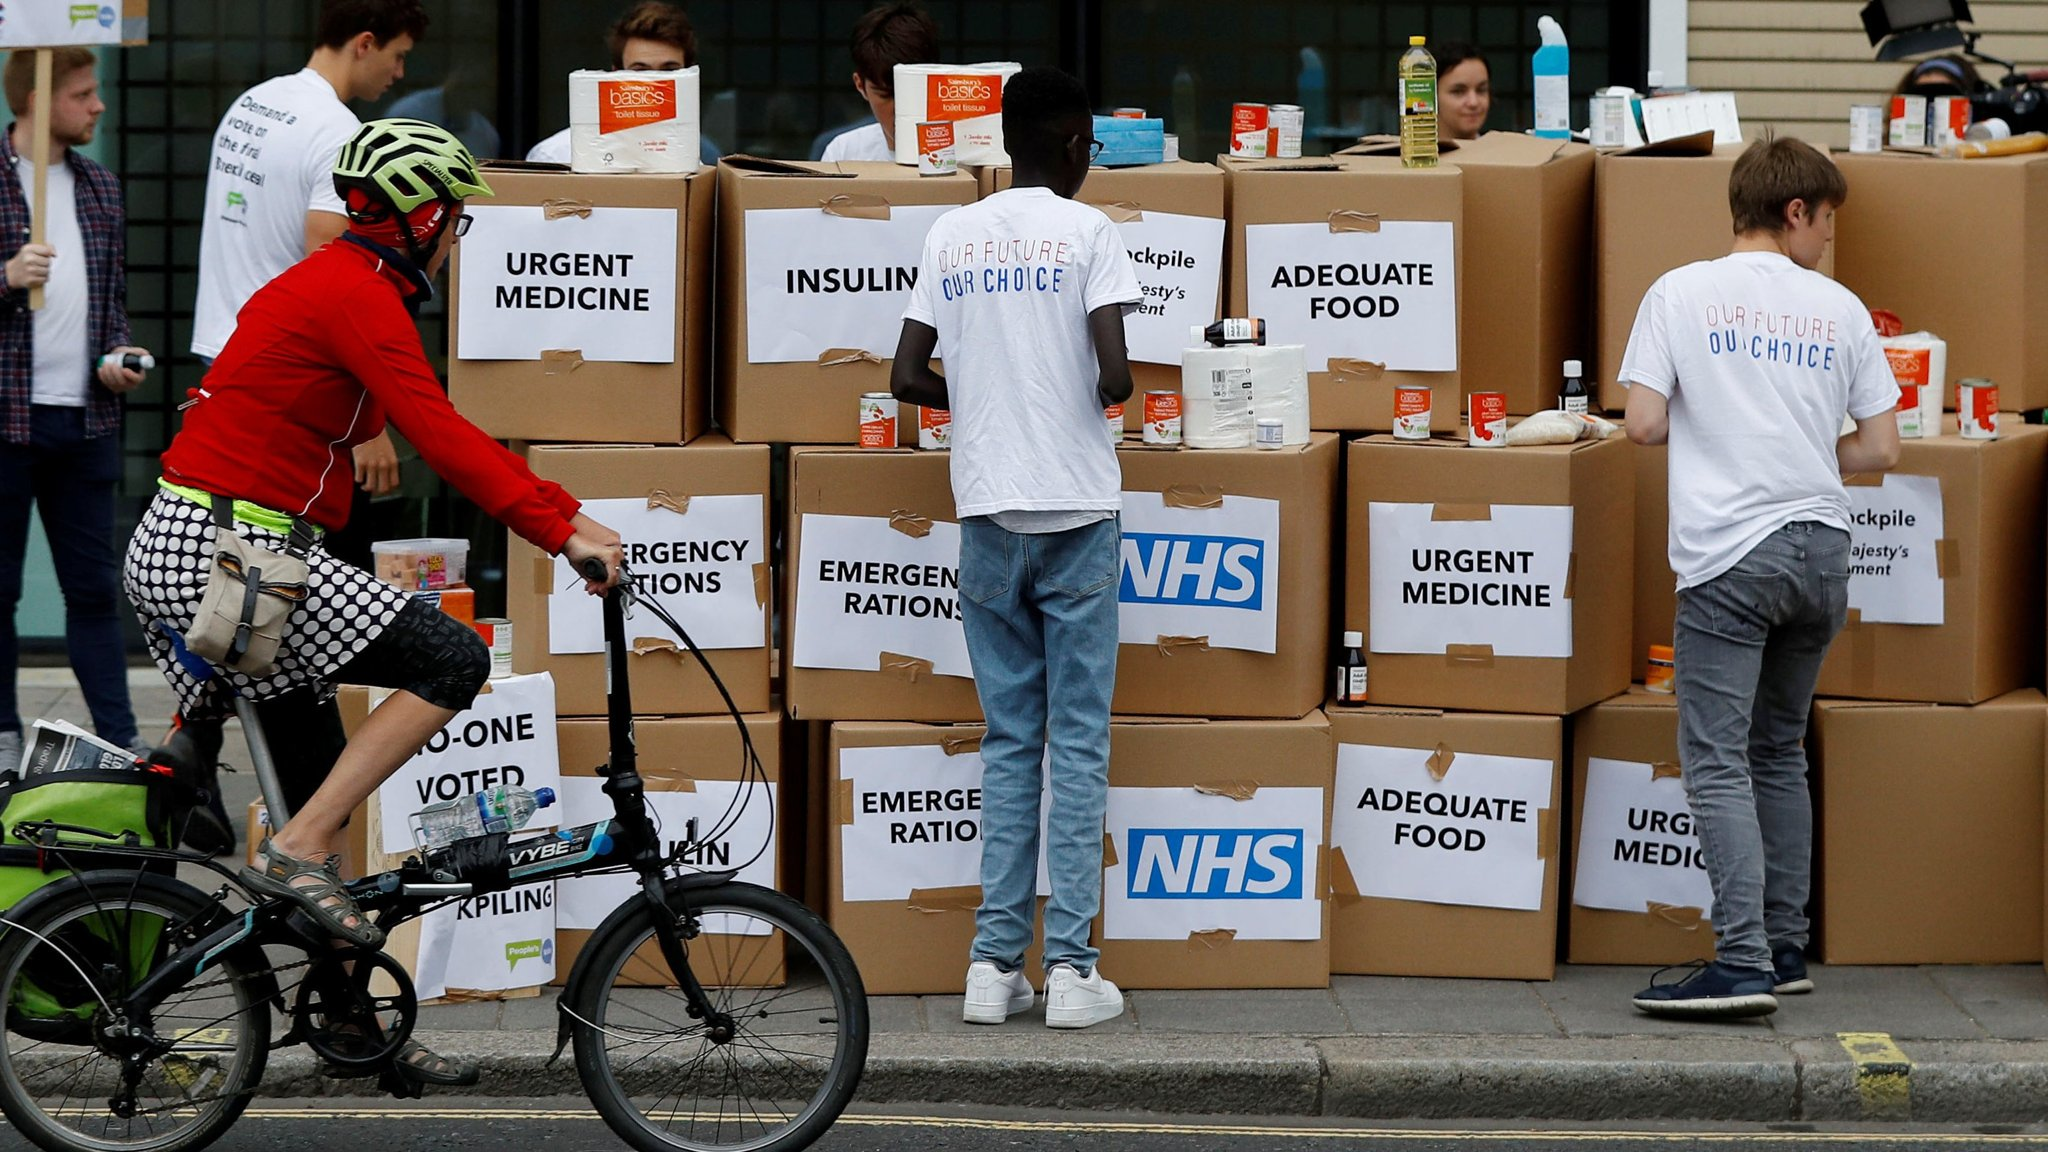 Brexit stockpiling